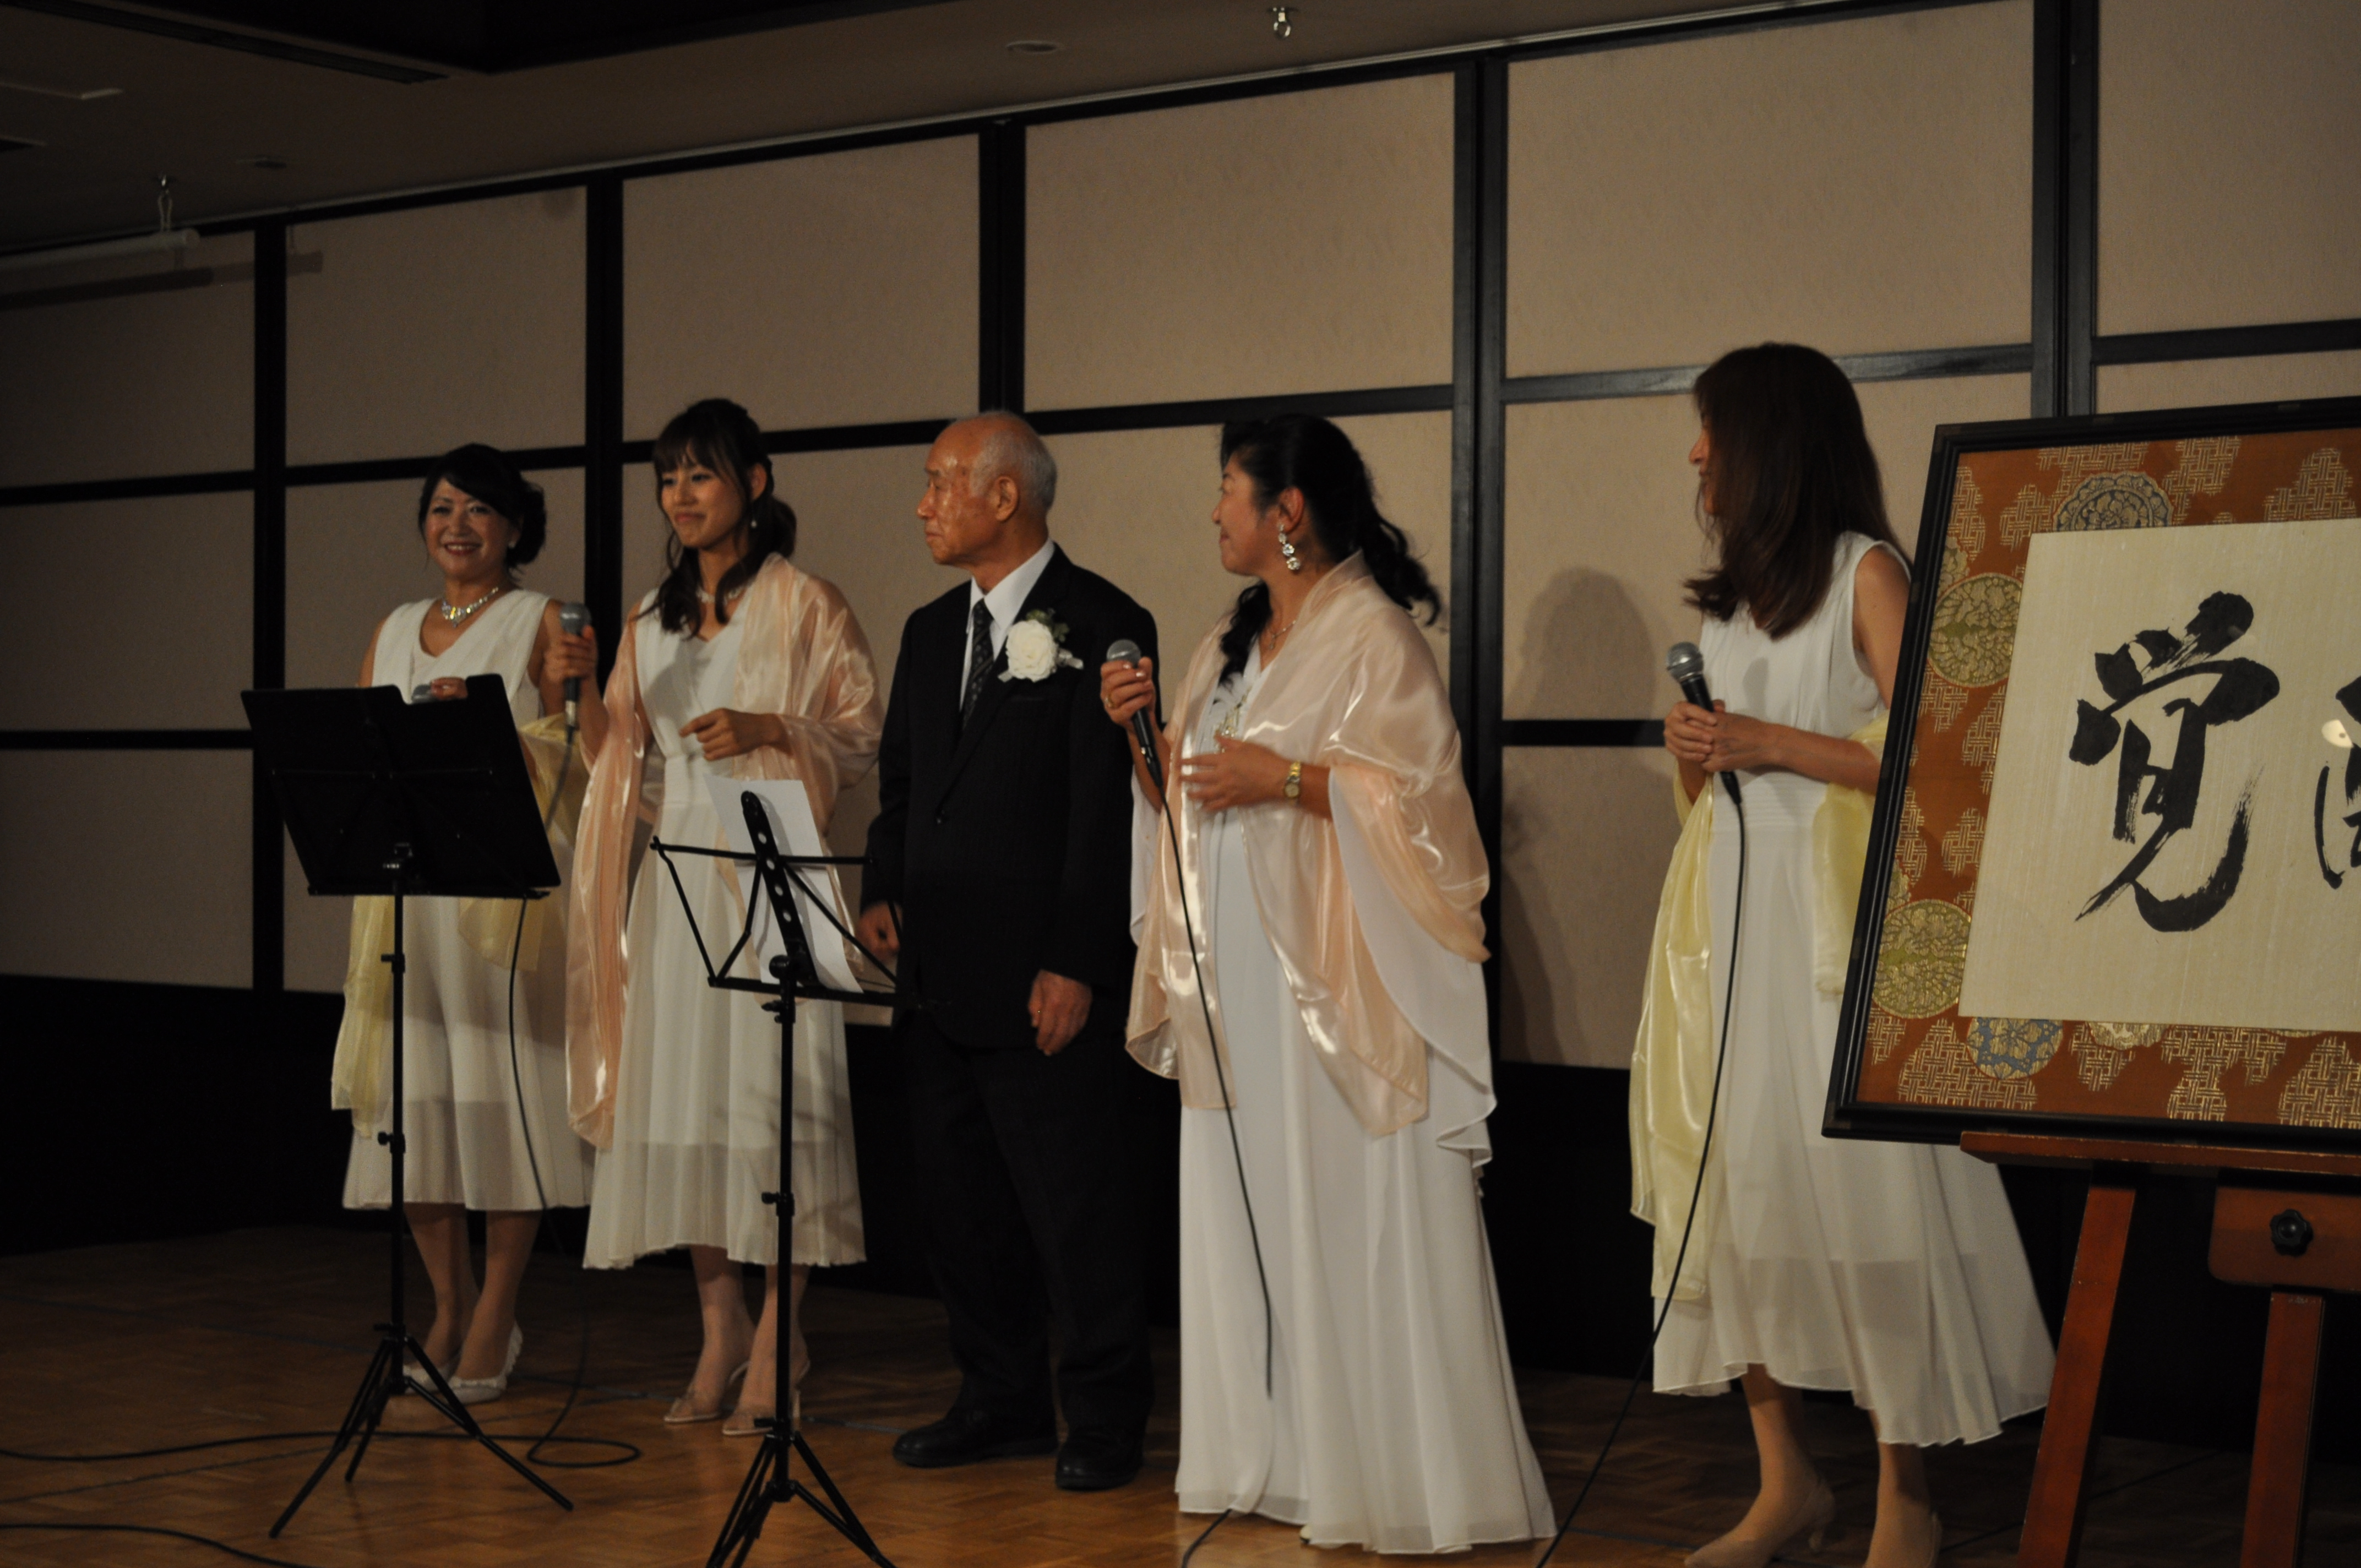 DSC 0522 - 第6回思風会全国大会2018in東京開催